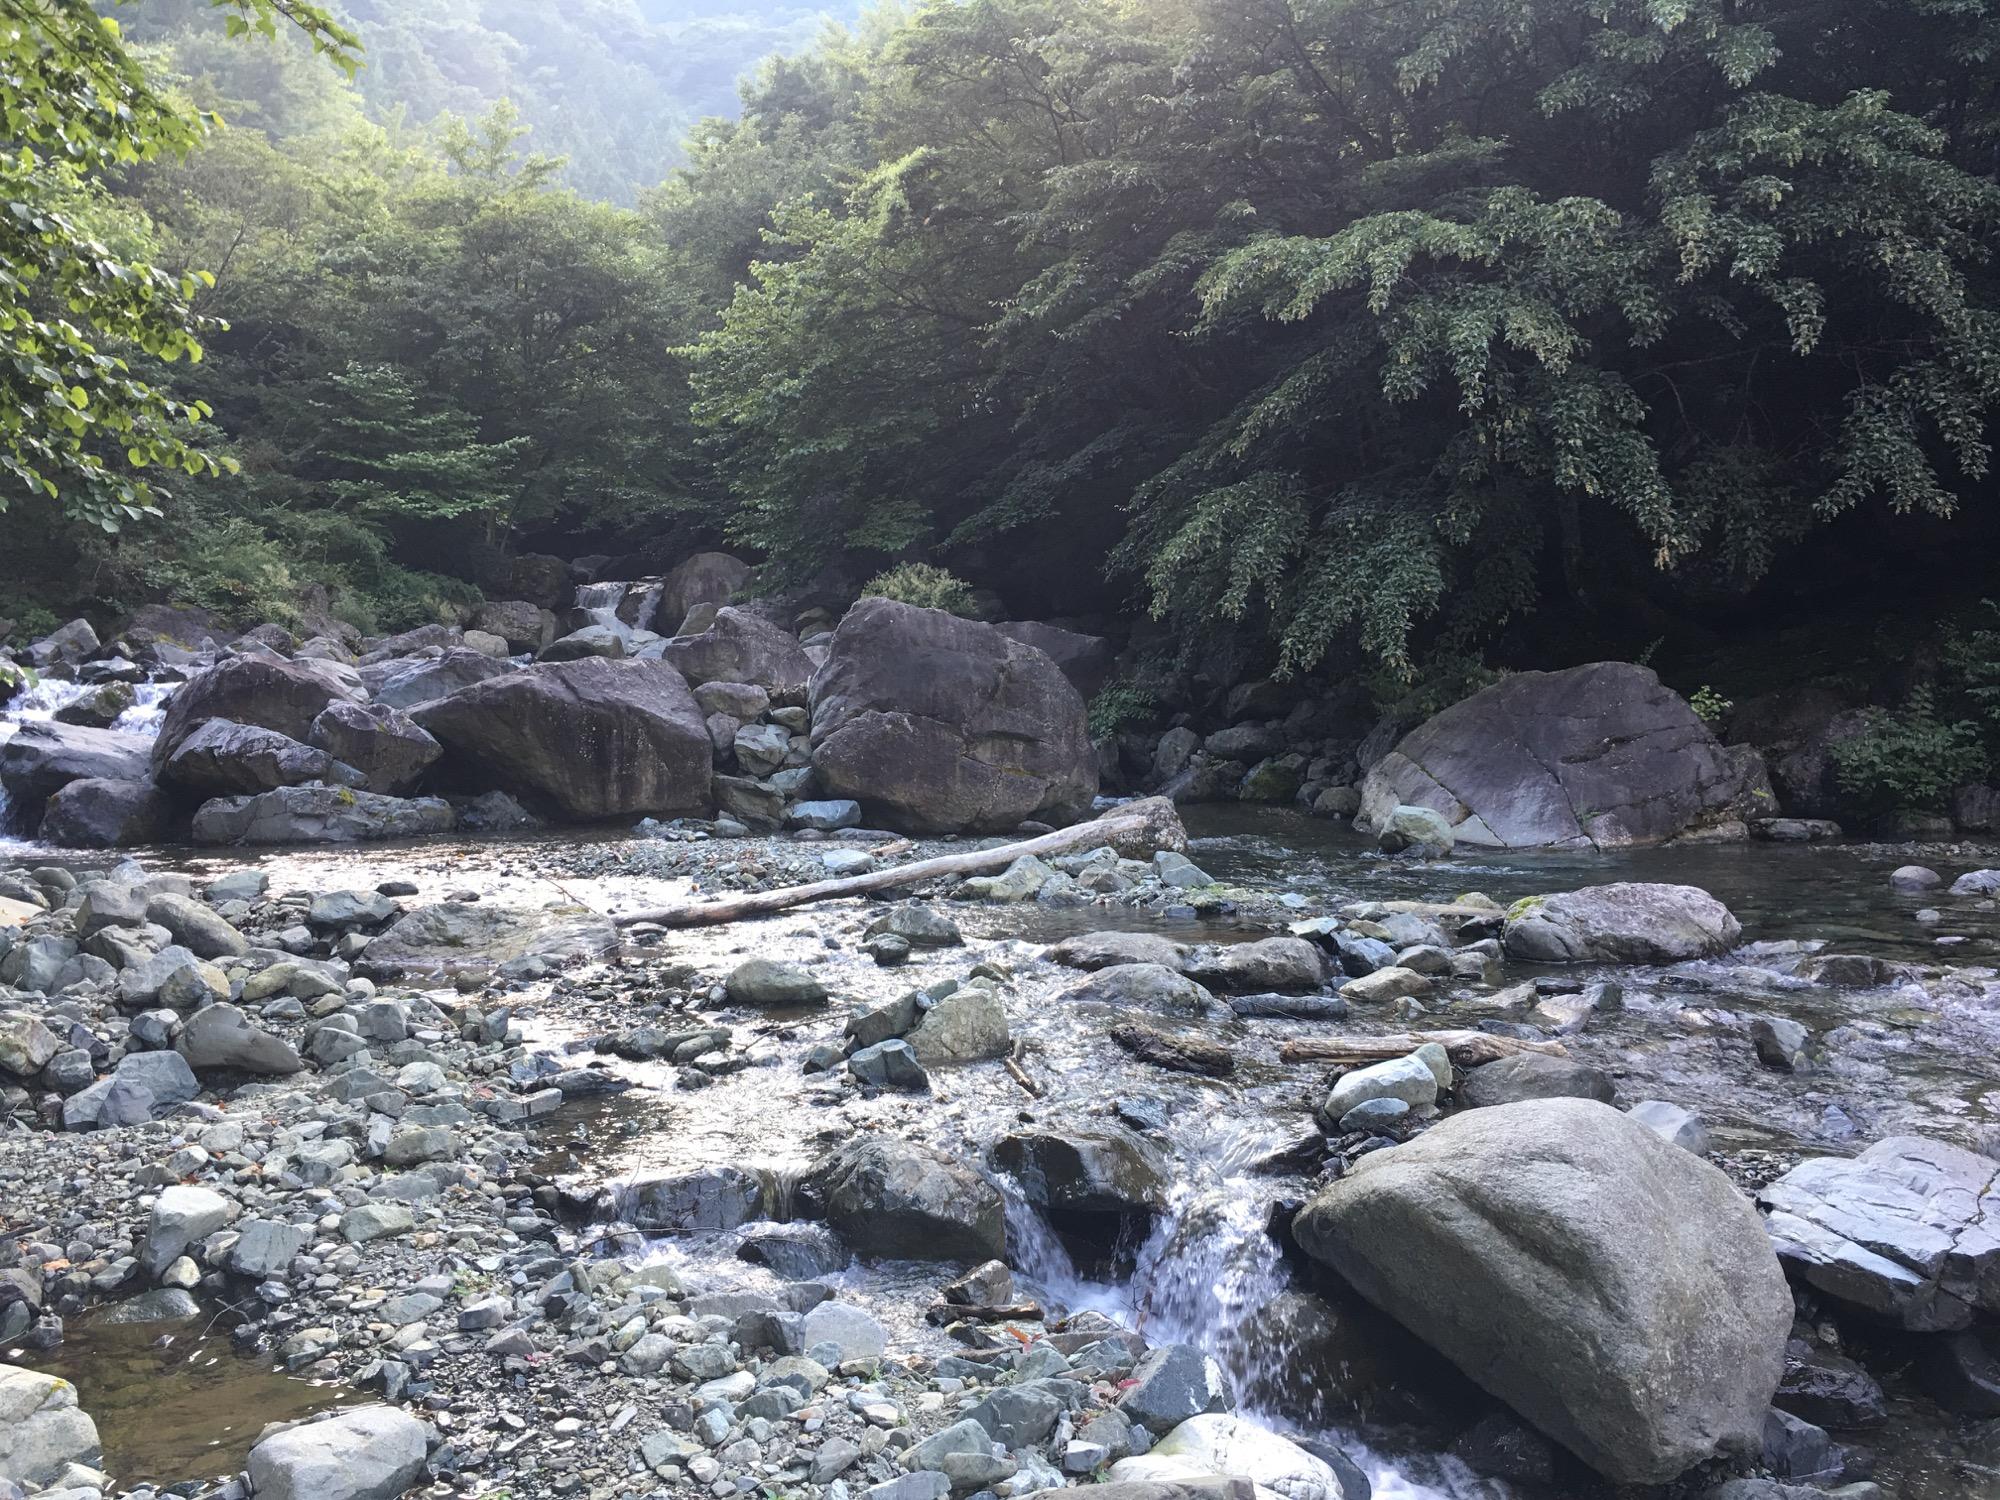 A beautiful mountain stream